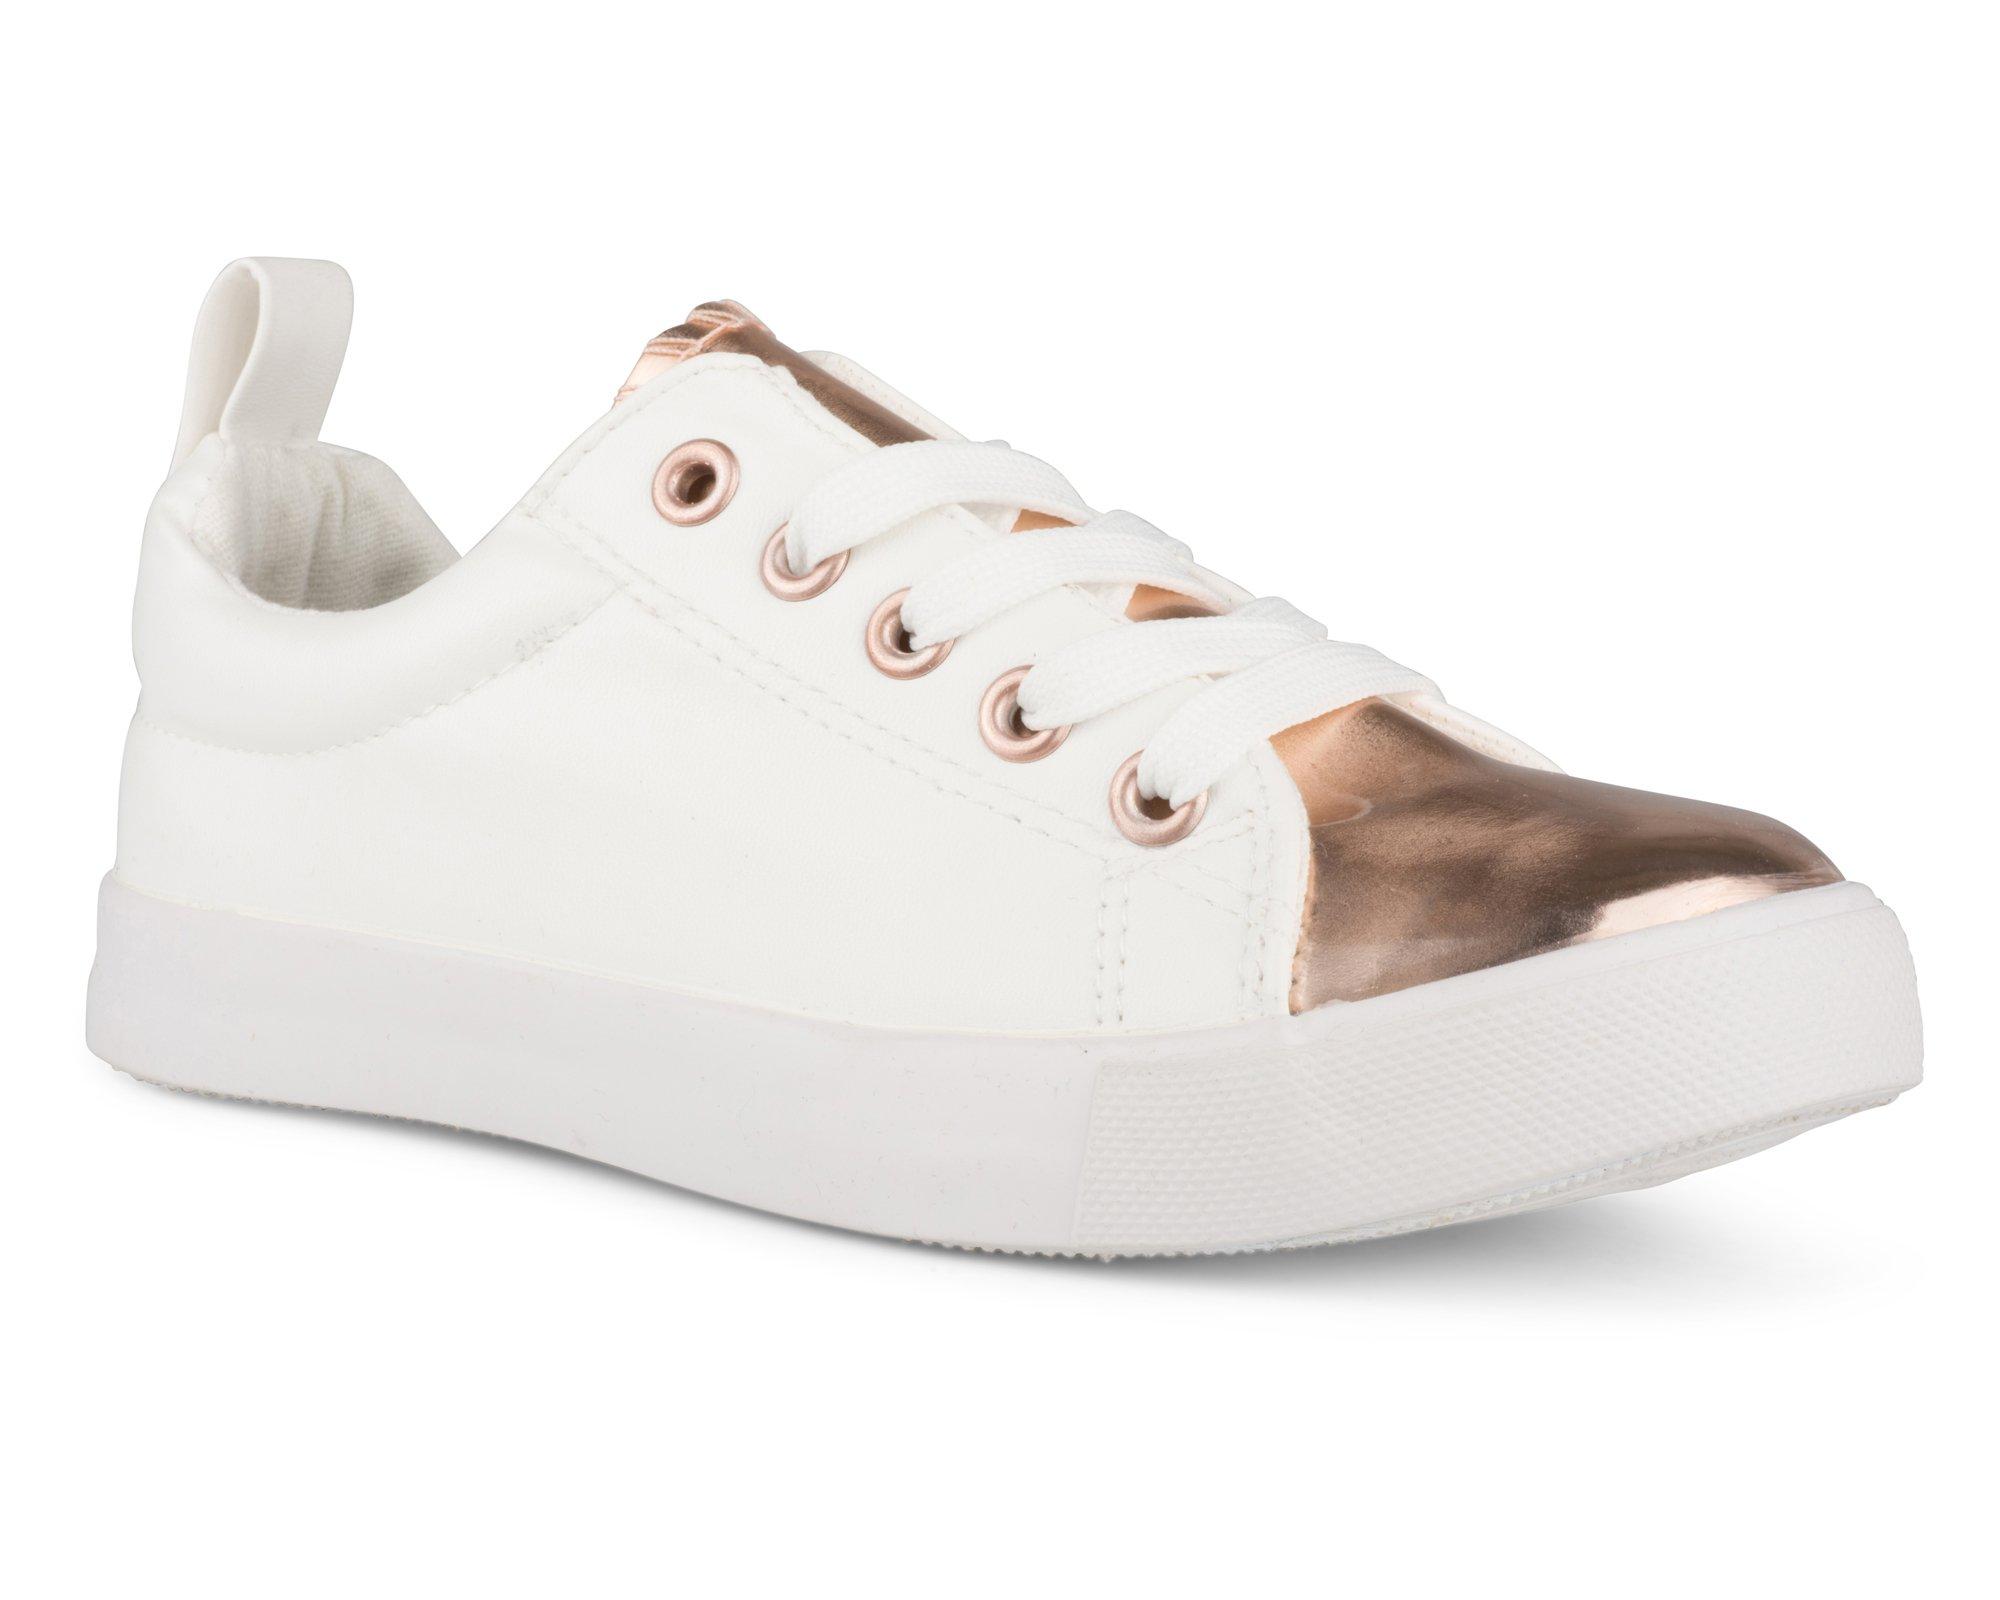 Twisted Girl's Faux Leather and Metallic Sneaker - KIXLO240AKWHITE, Size 13